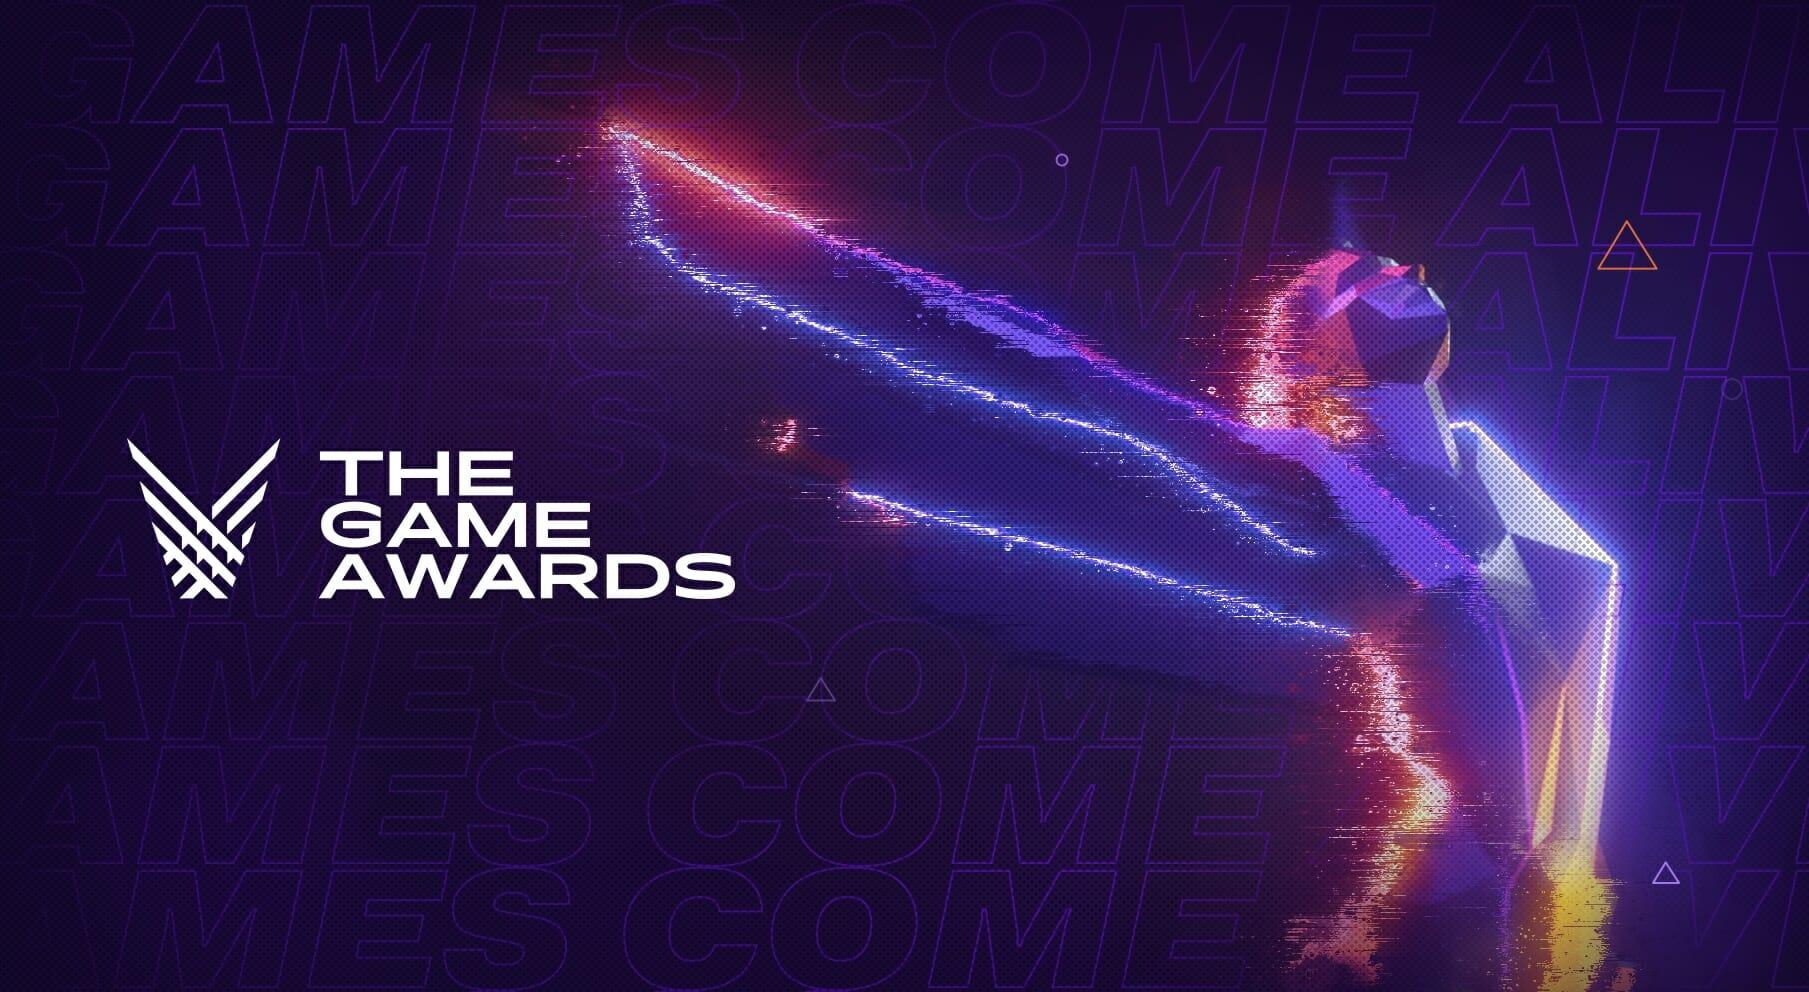 Habrá 10 grandes anuncios durante The Game Awards 2019